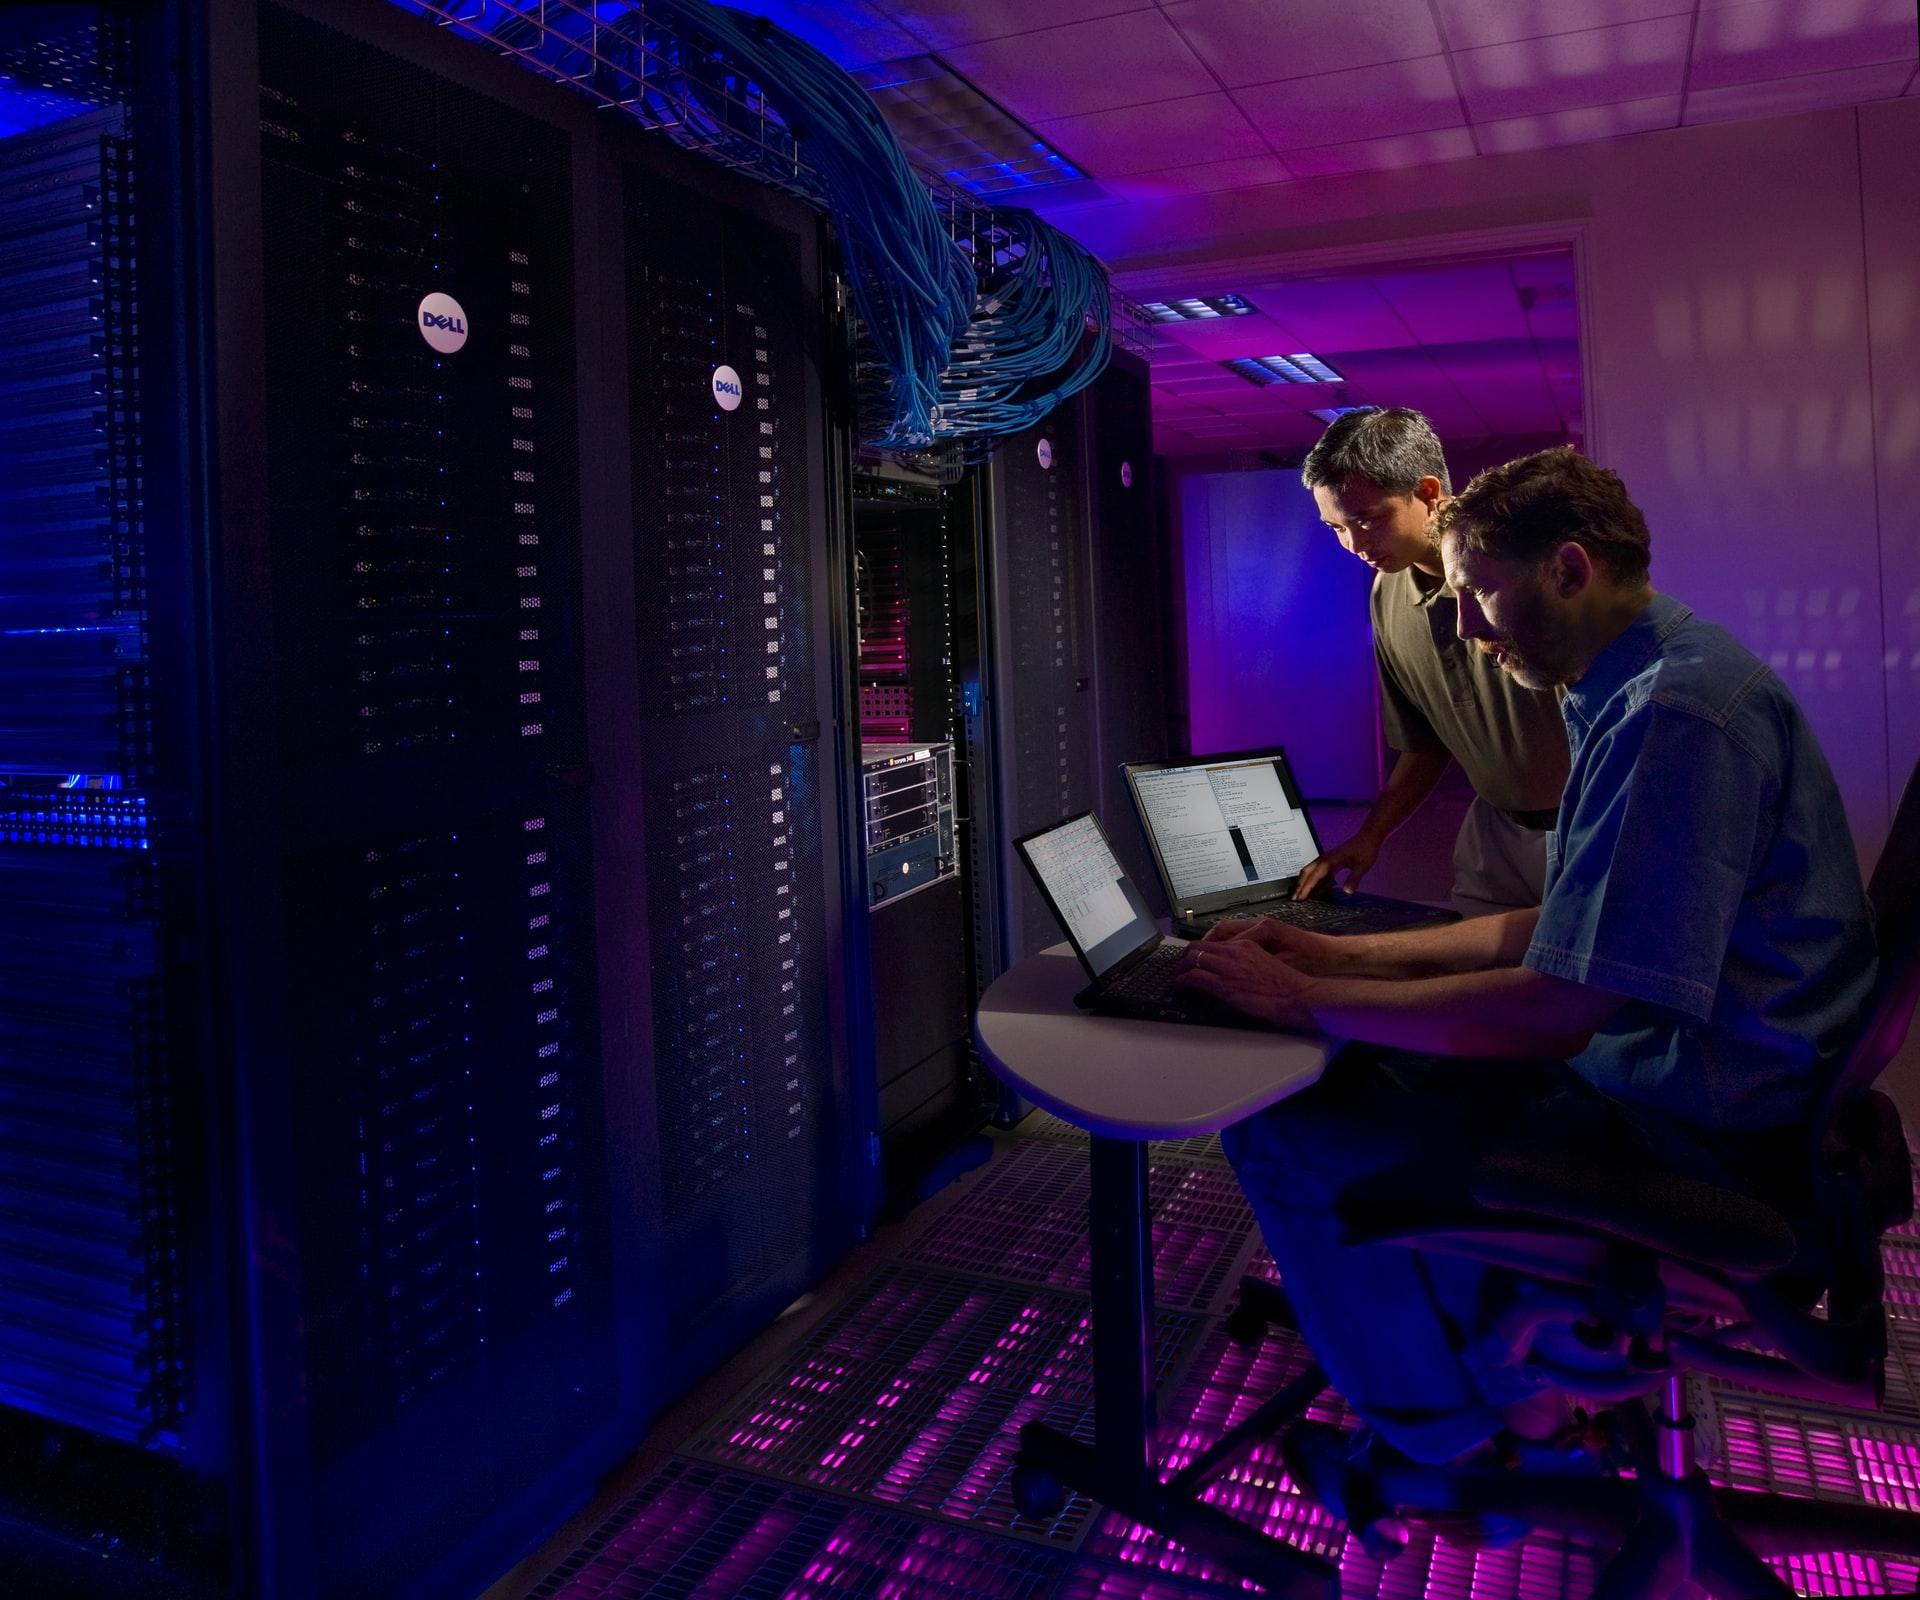 scalable cloud storage, enterprise data centers, global data centers,